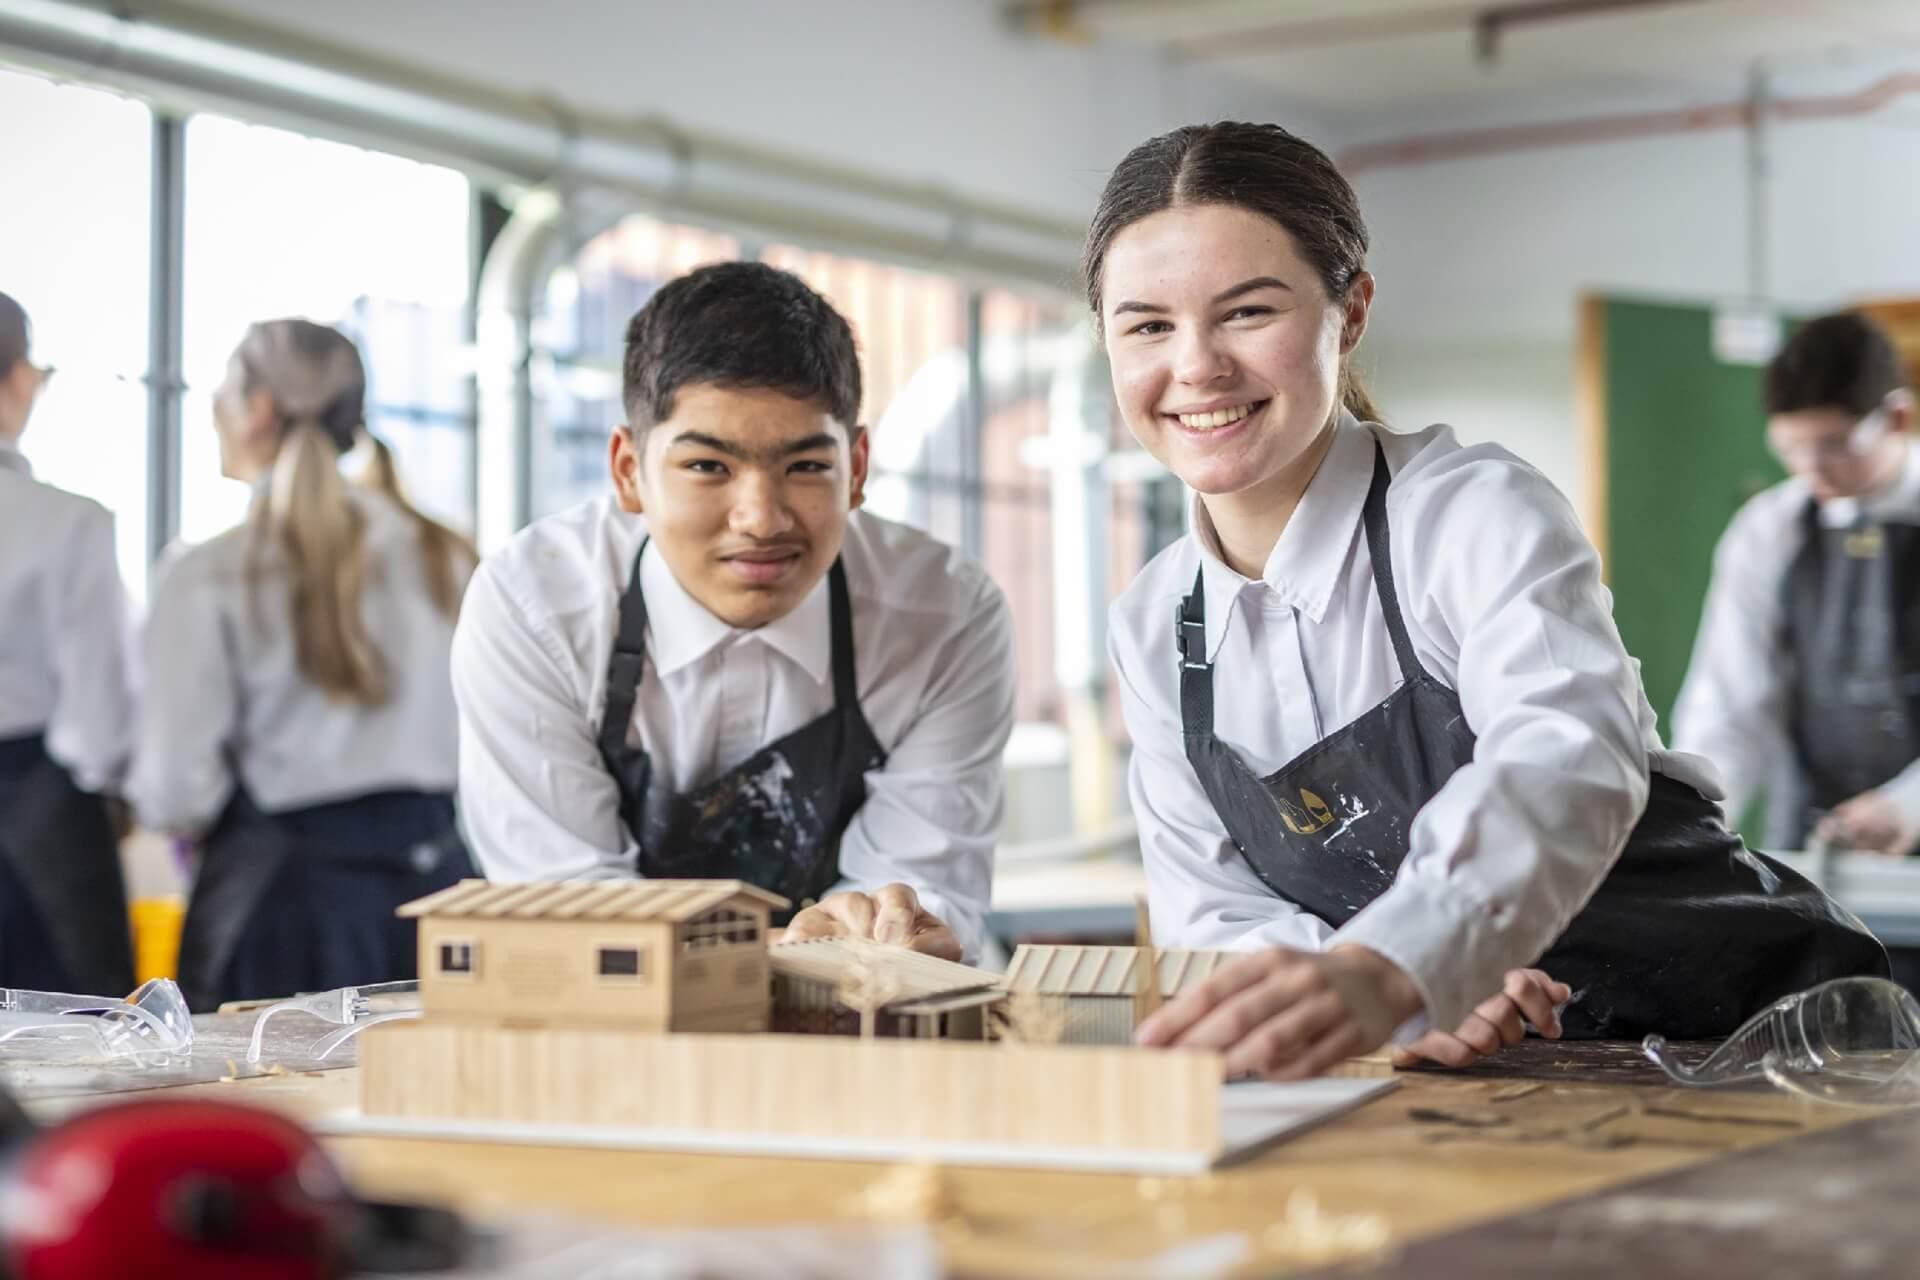 Metro x ACG — A world-class education at ACG schools.